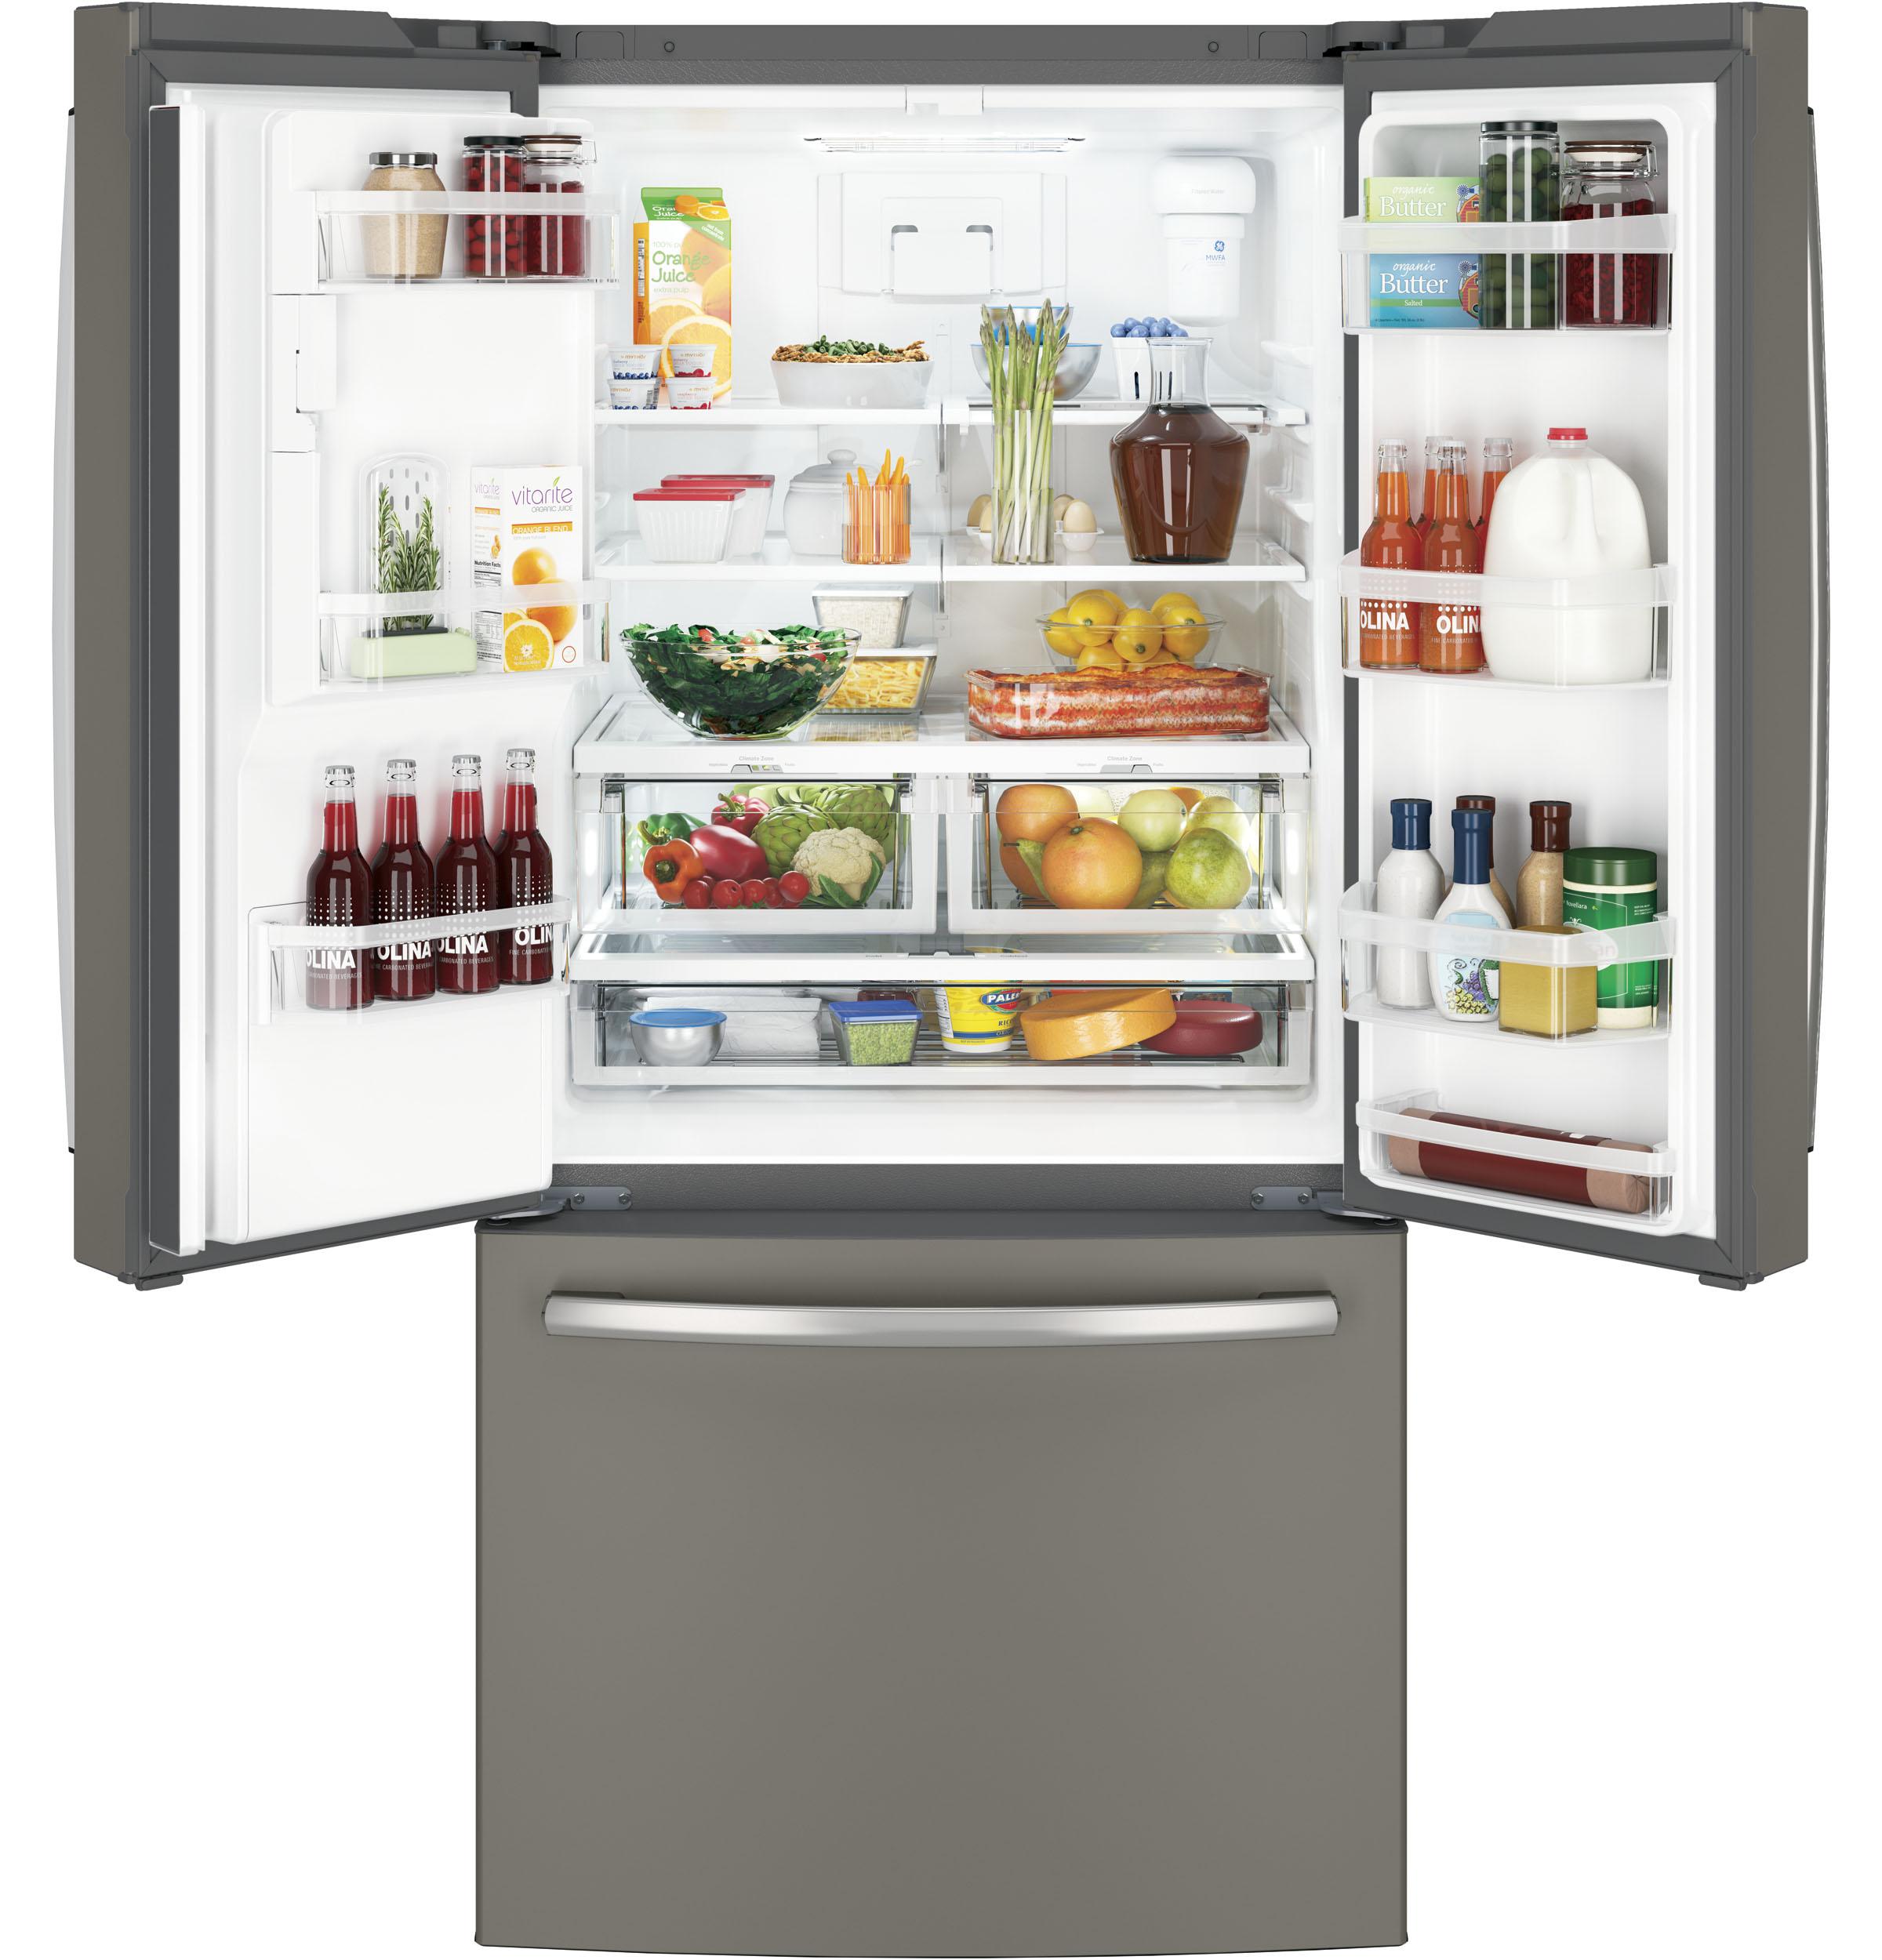 Model: GYE18JMLES | GE® ENERGY STAR® 17.5 Cu. Ft. Counter-Depth French-Door Refrigerator